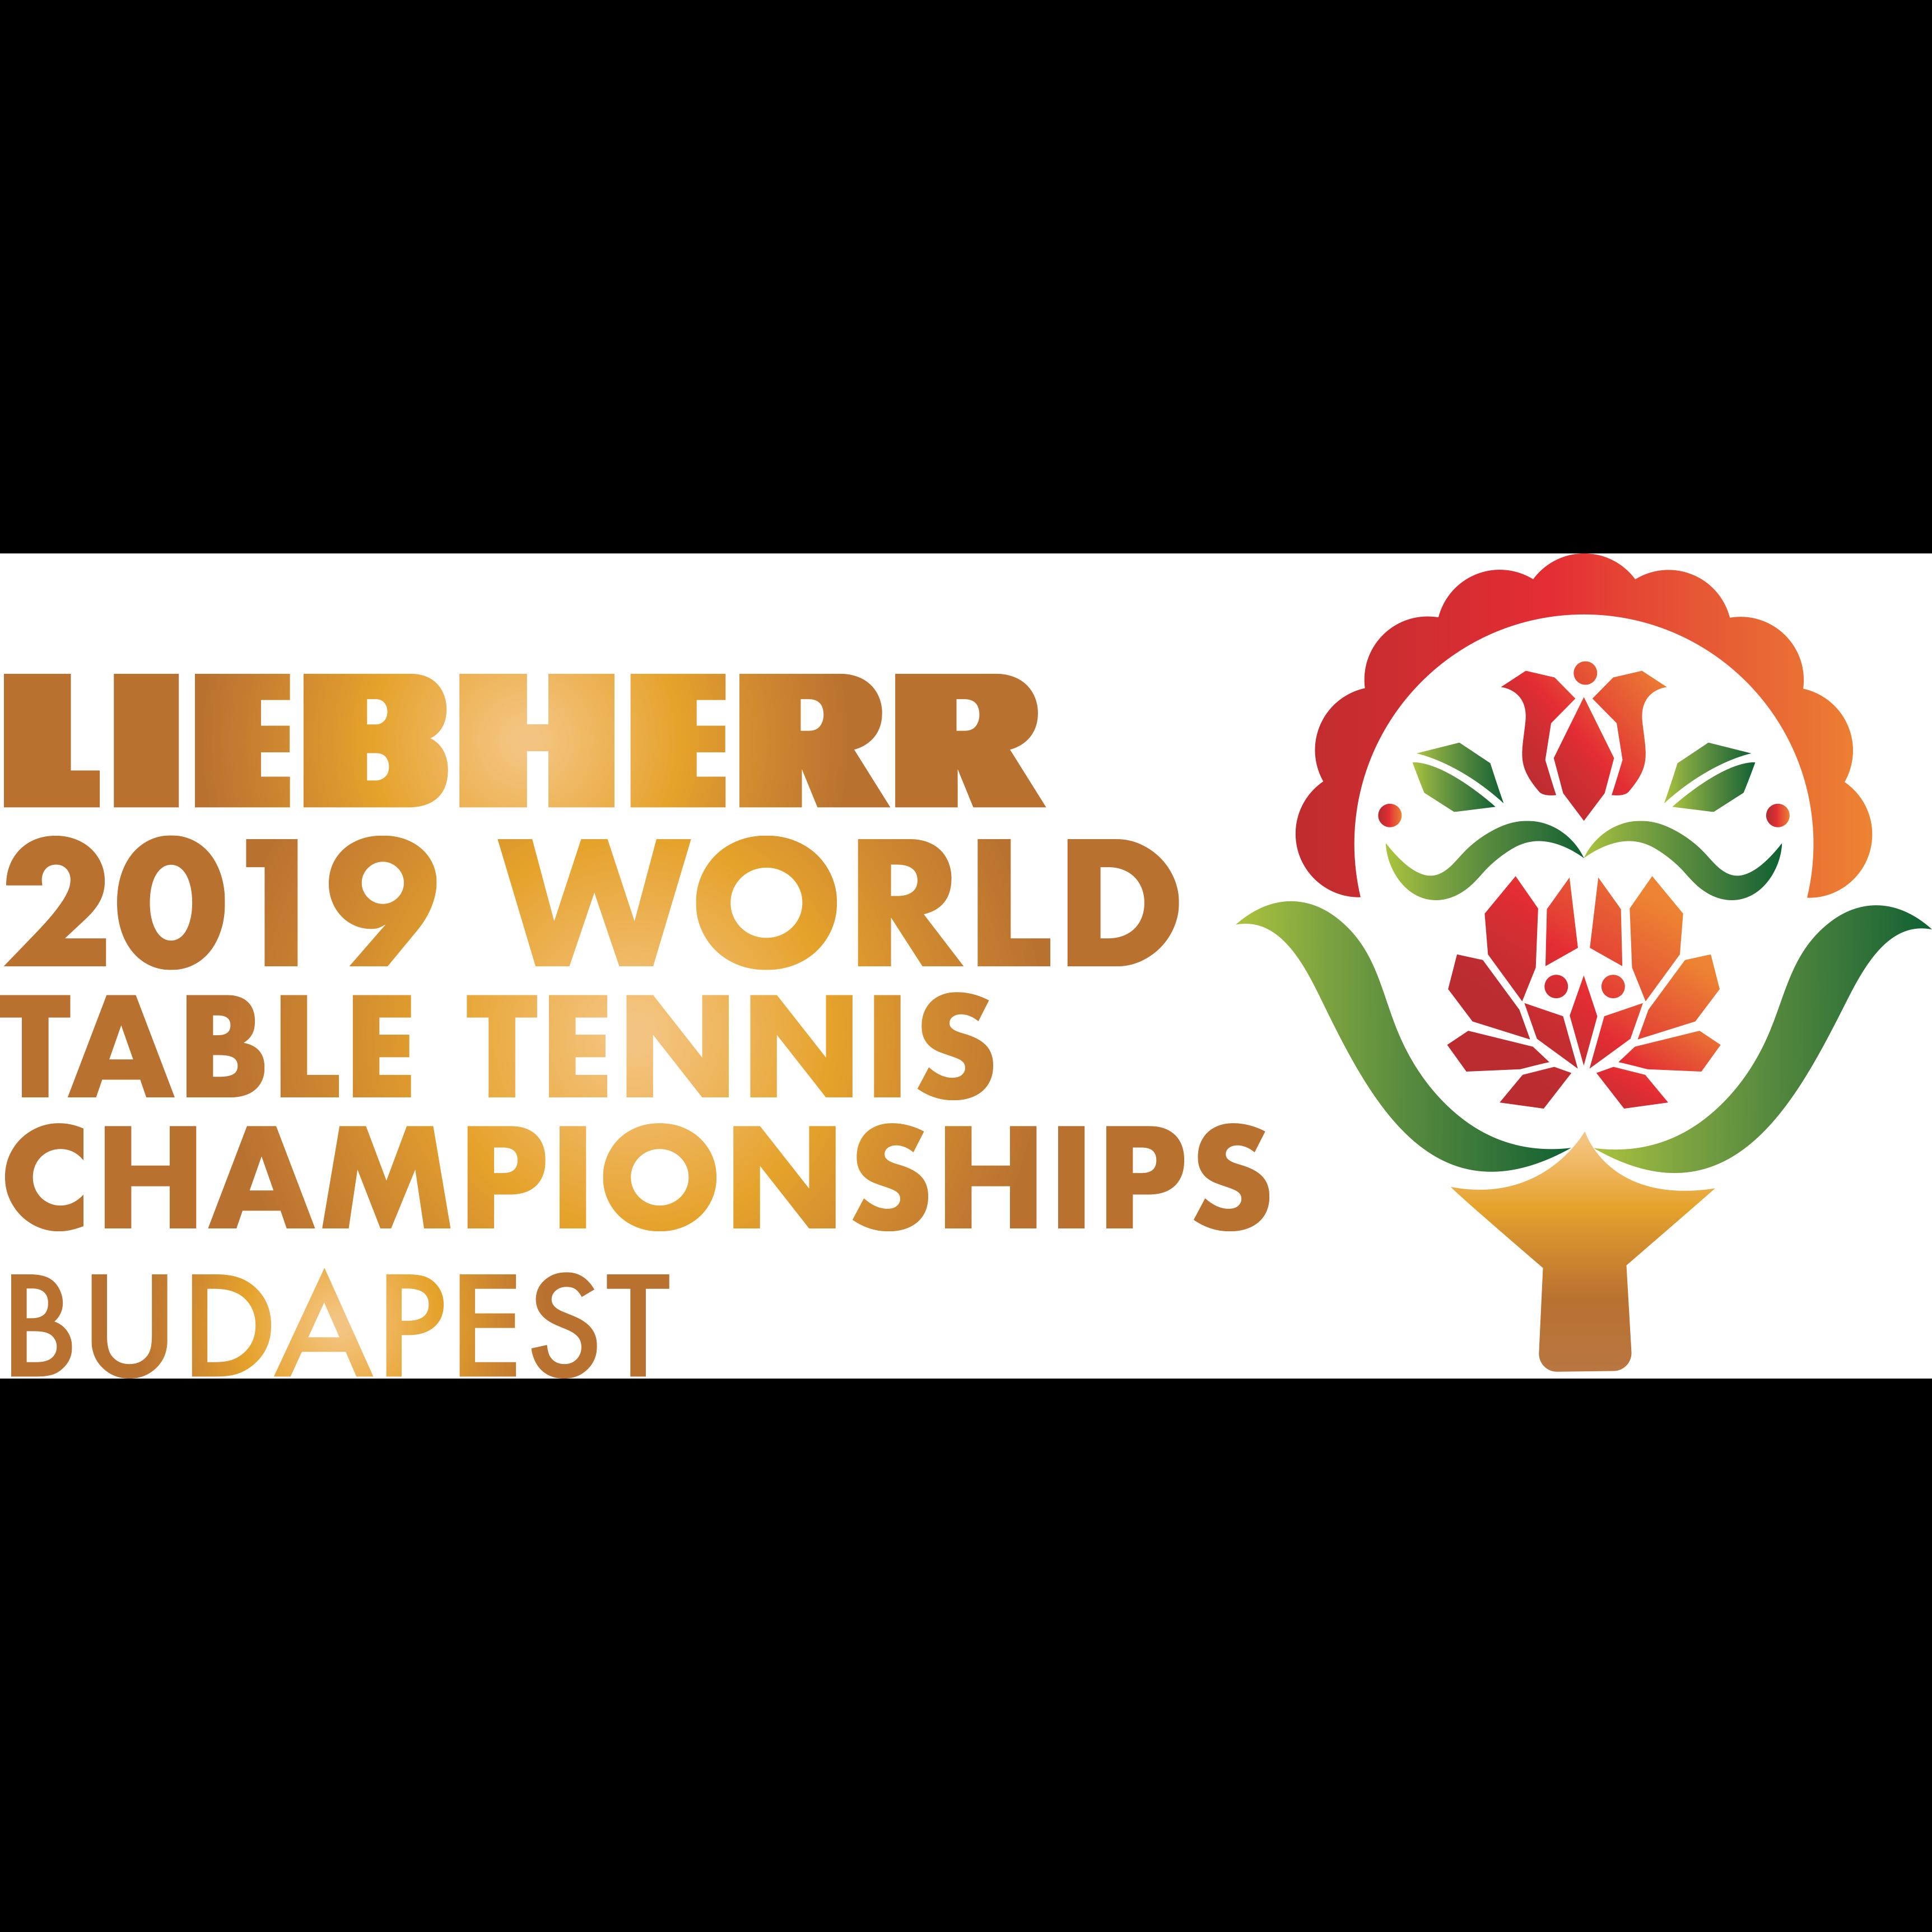 2019 World Table Tennis Championships - Individual